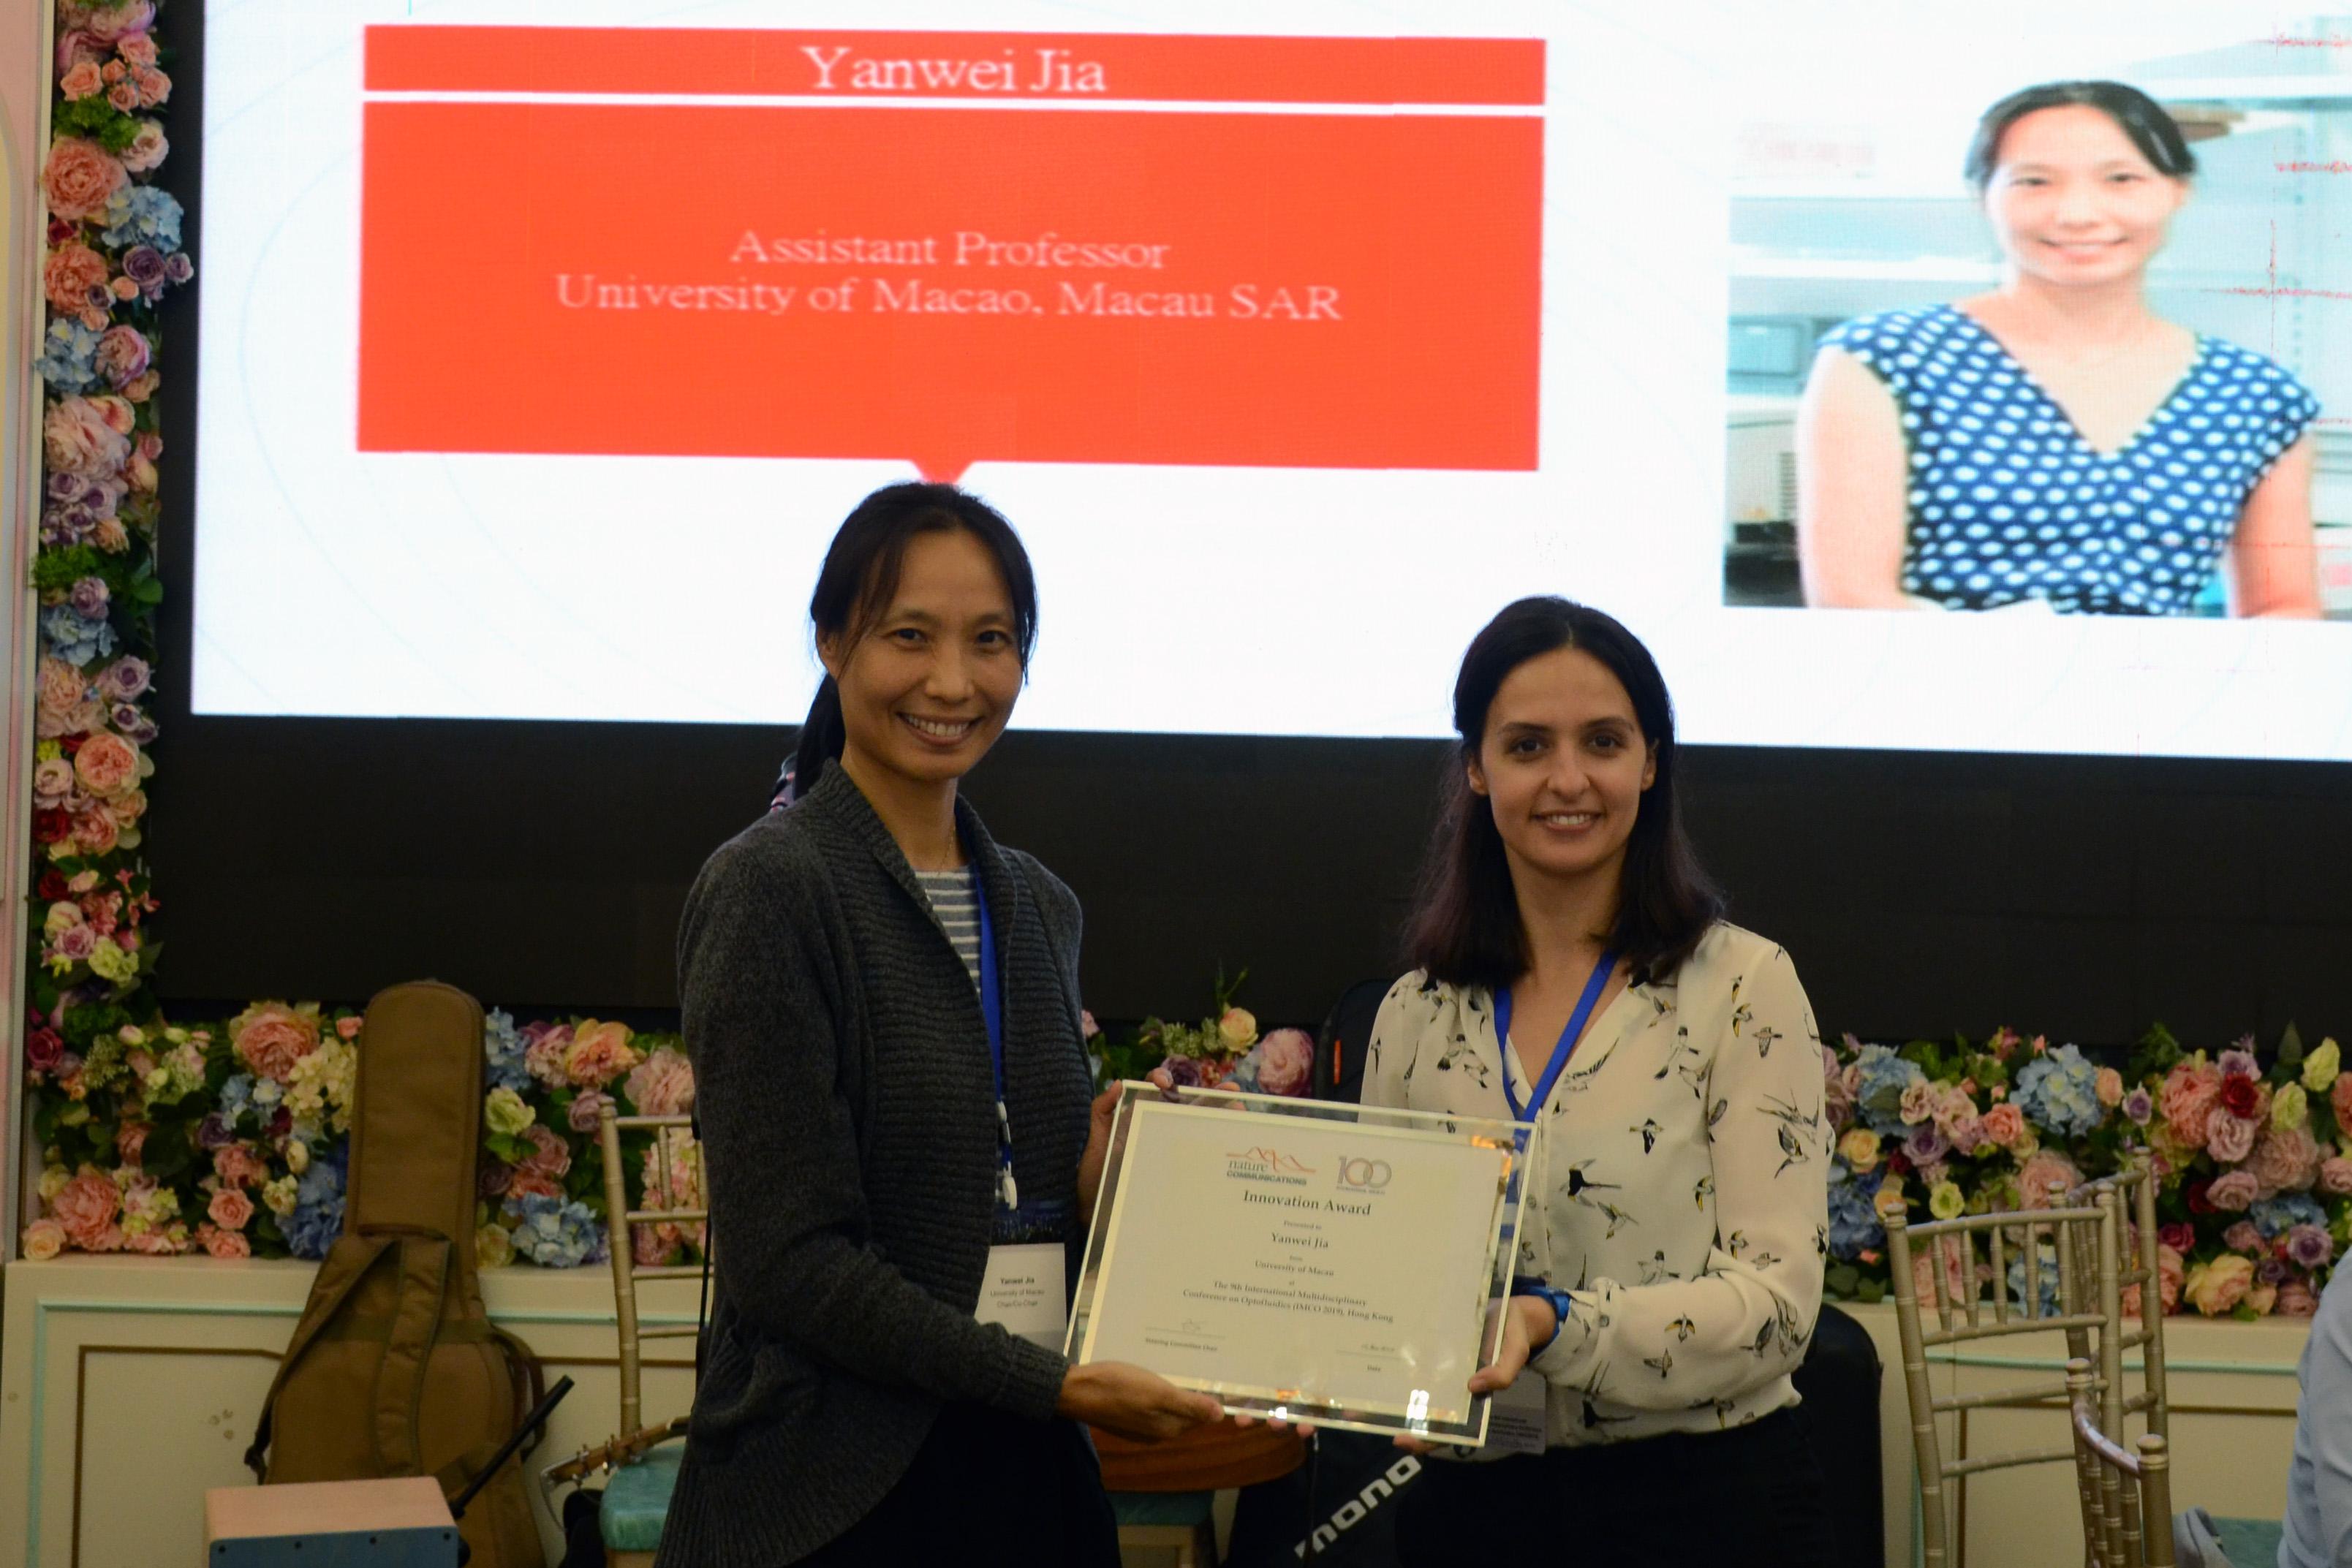 Dr Jia Yanwei receives an Innovation Award at the International Multidisciplinary Conference on Optofluidics